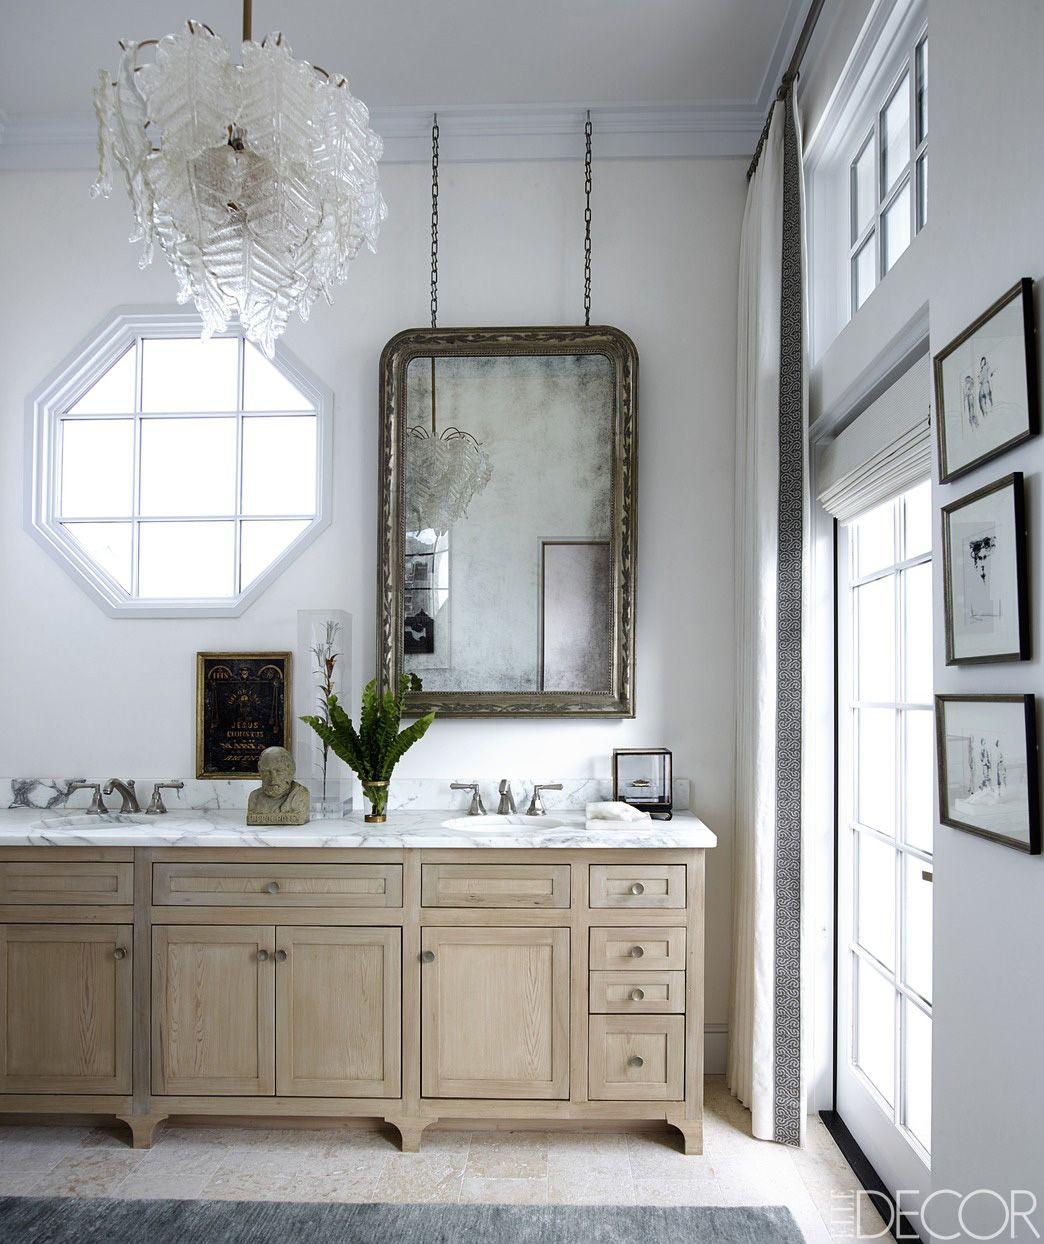 Pin On Amazing Bathrooms